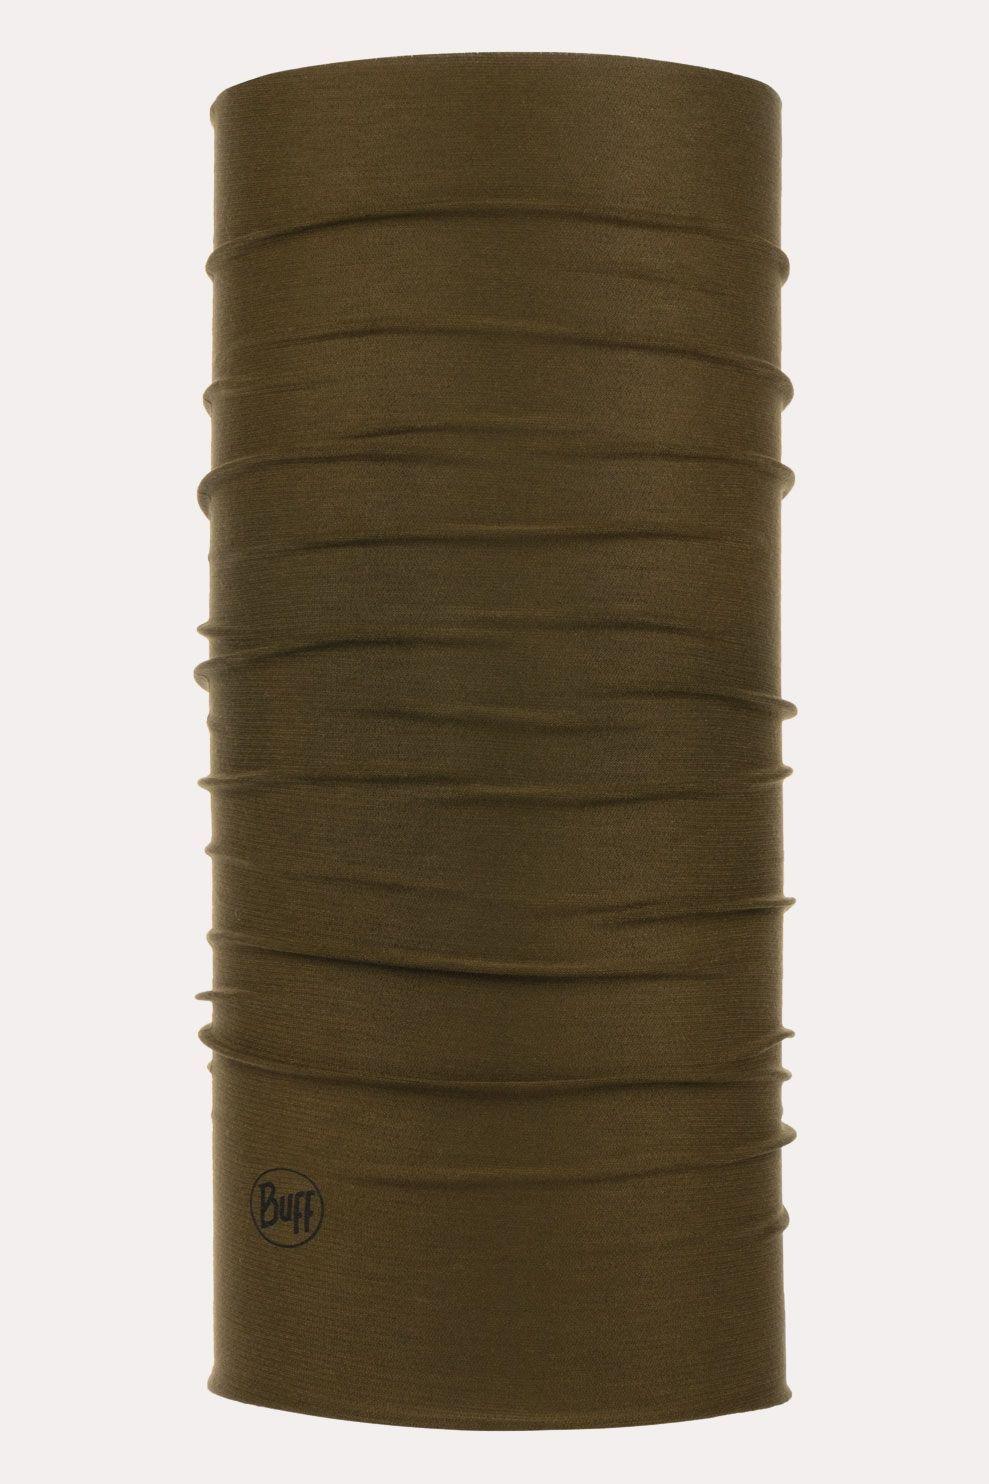 Buff Coolnet Uv+Insect Shield Solid Military Buff Middenkaki